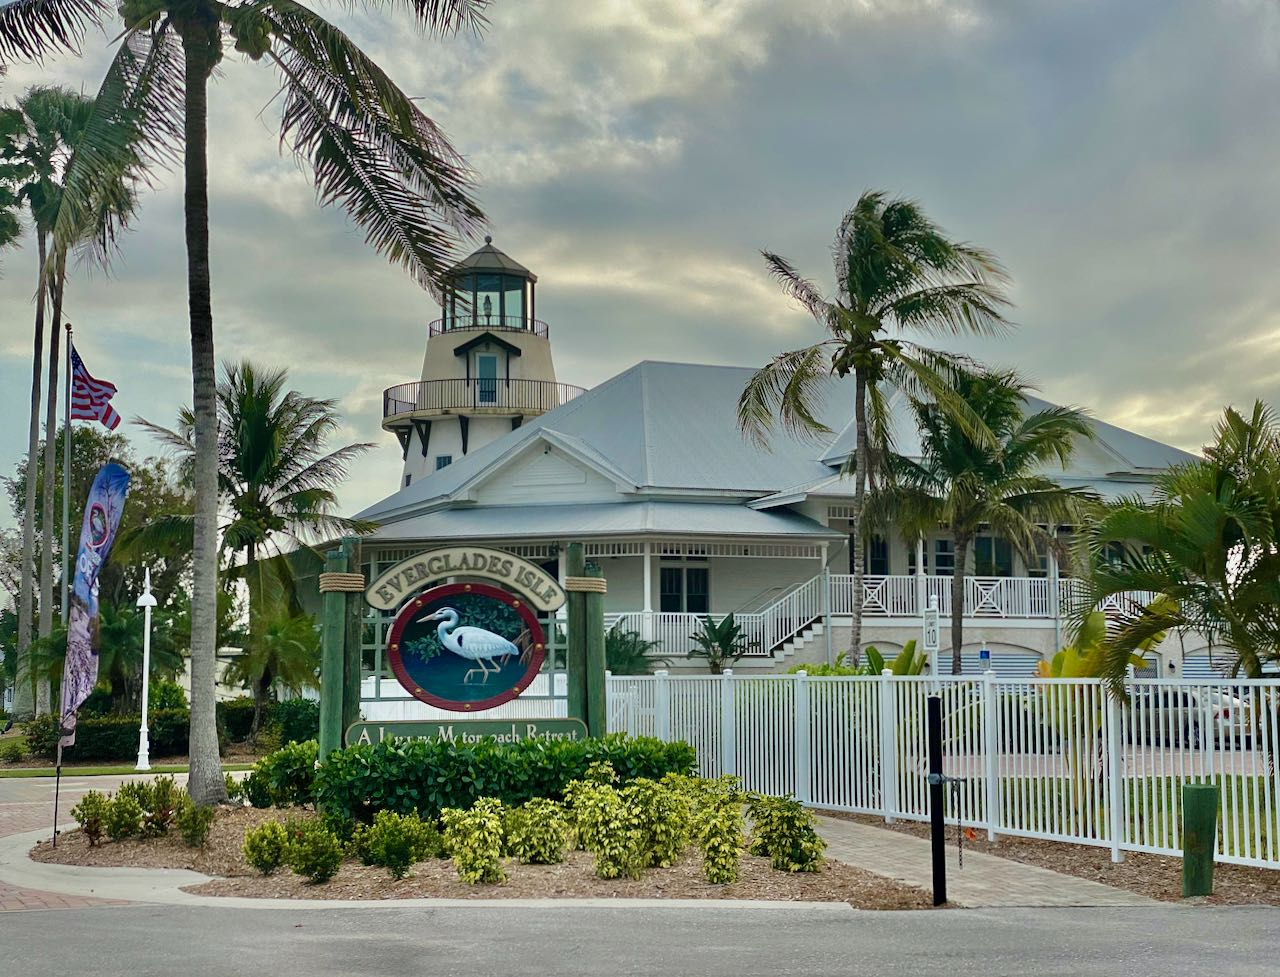 Everglades City 17 steder å stoppe langs Tamiami Trail/ U.S Highway 41